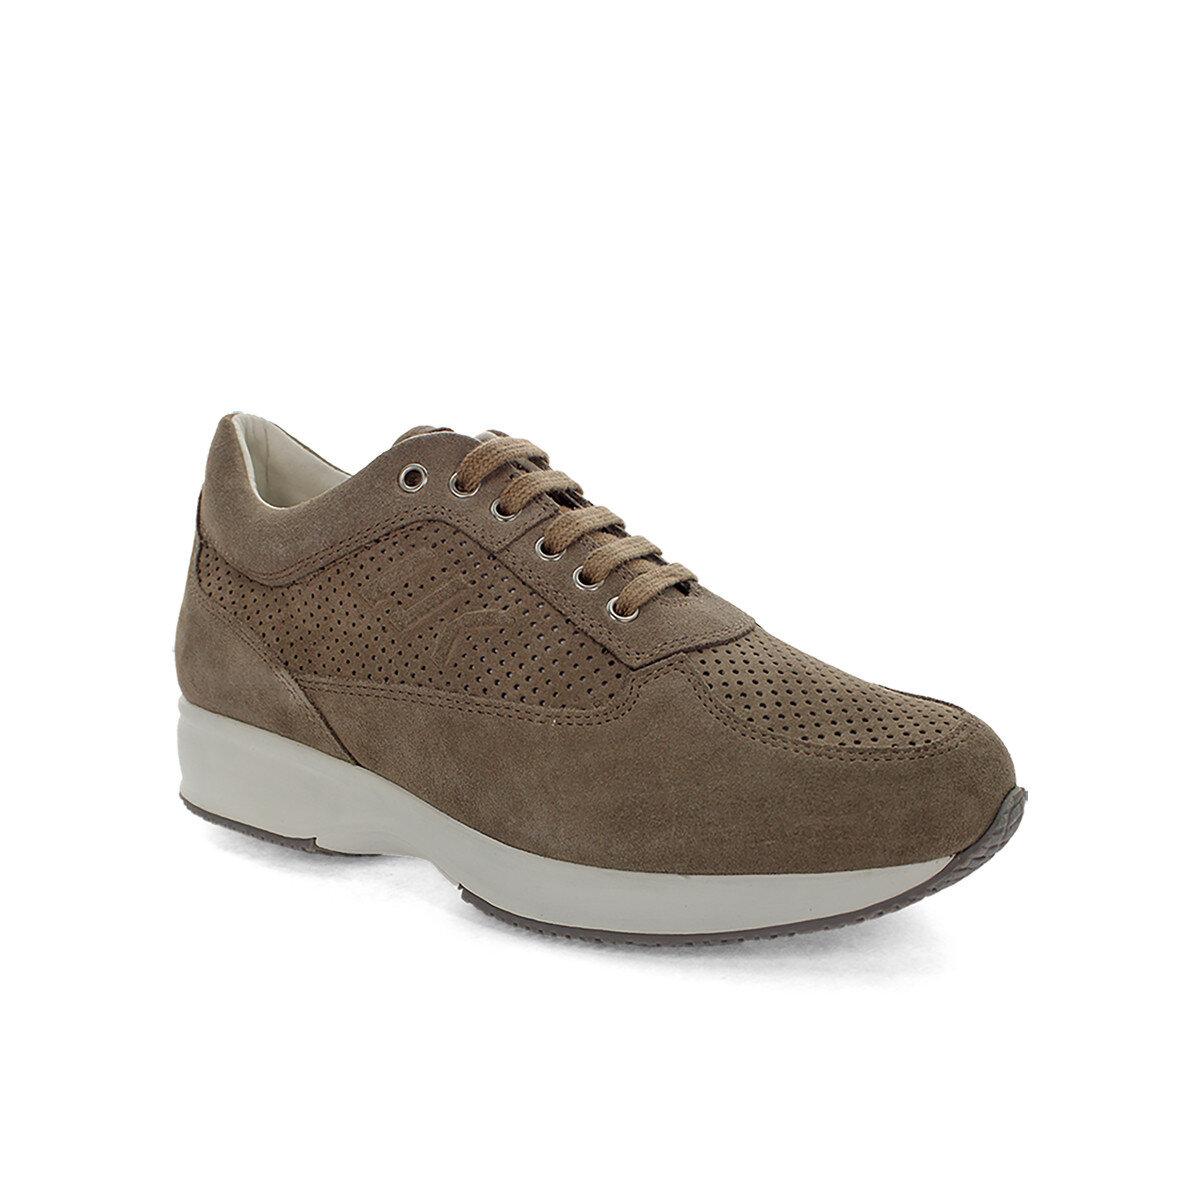 RAUL Sneakers Uomo